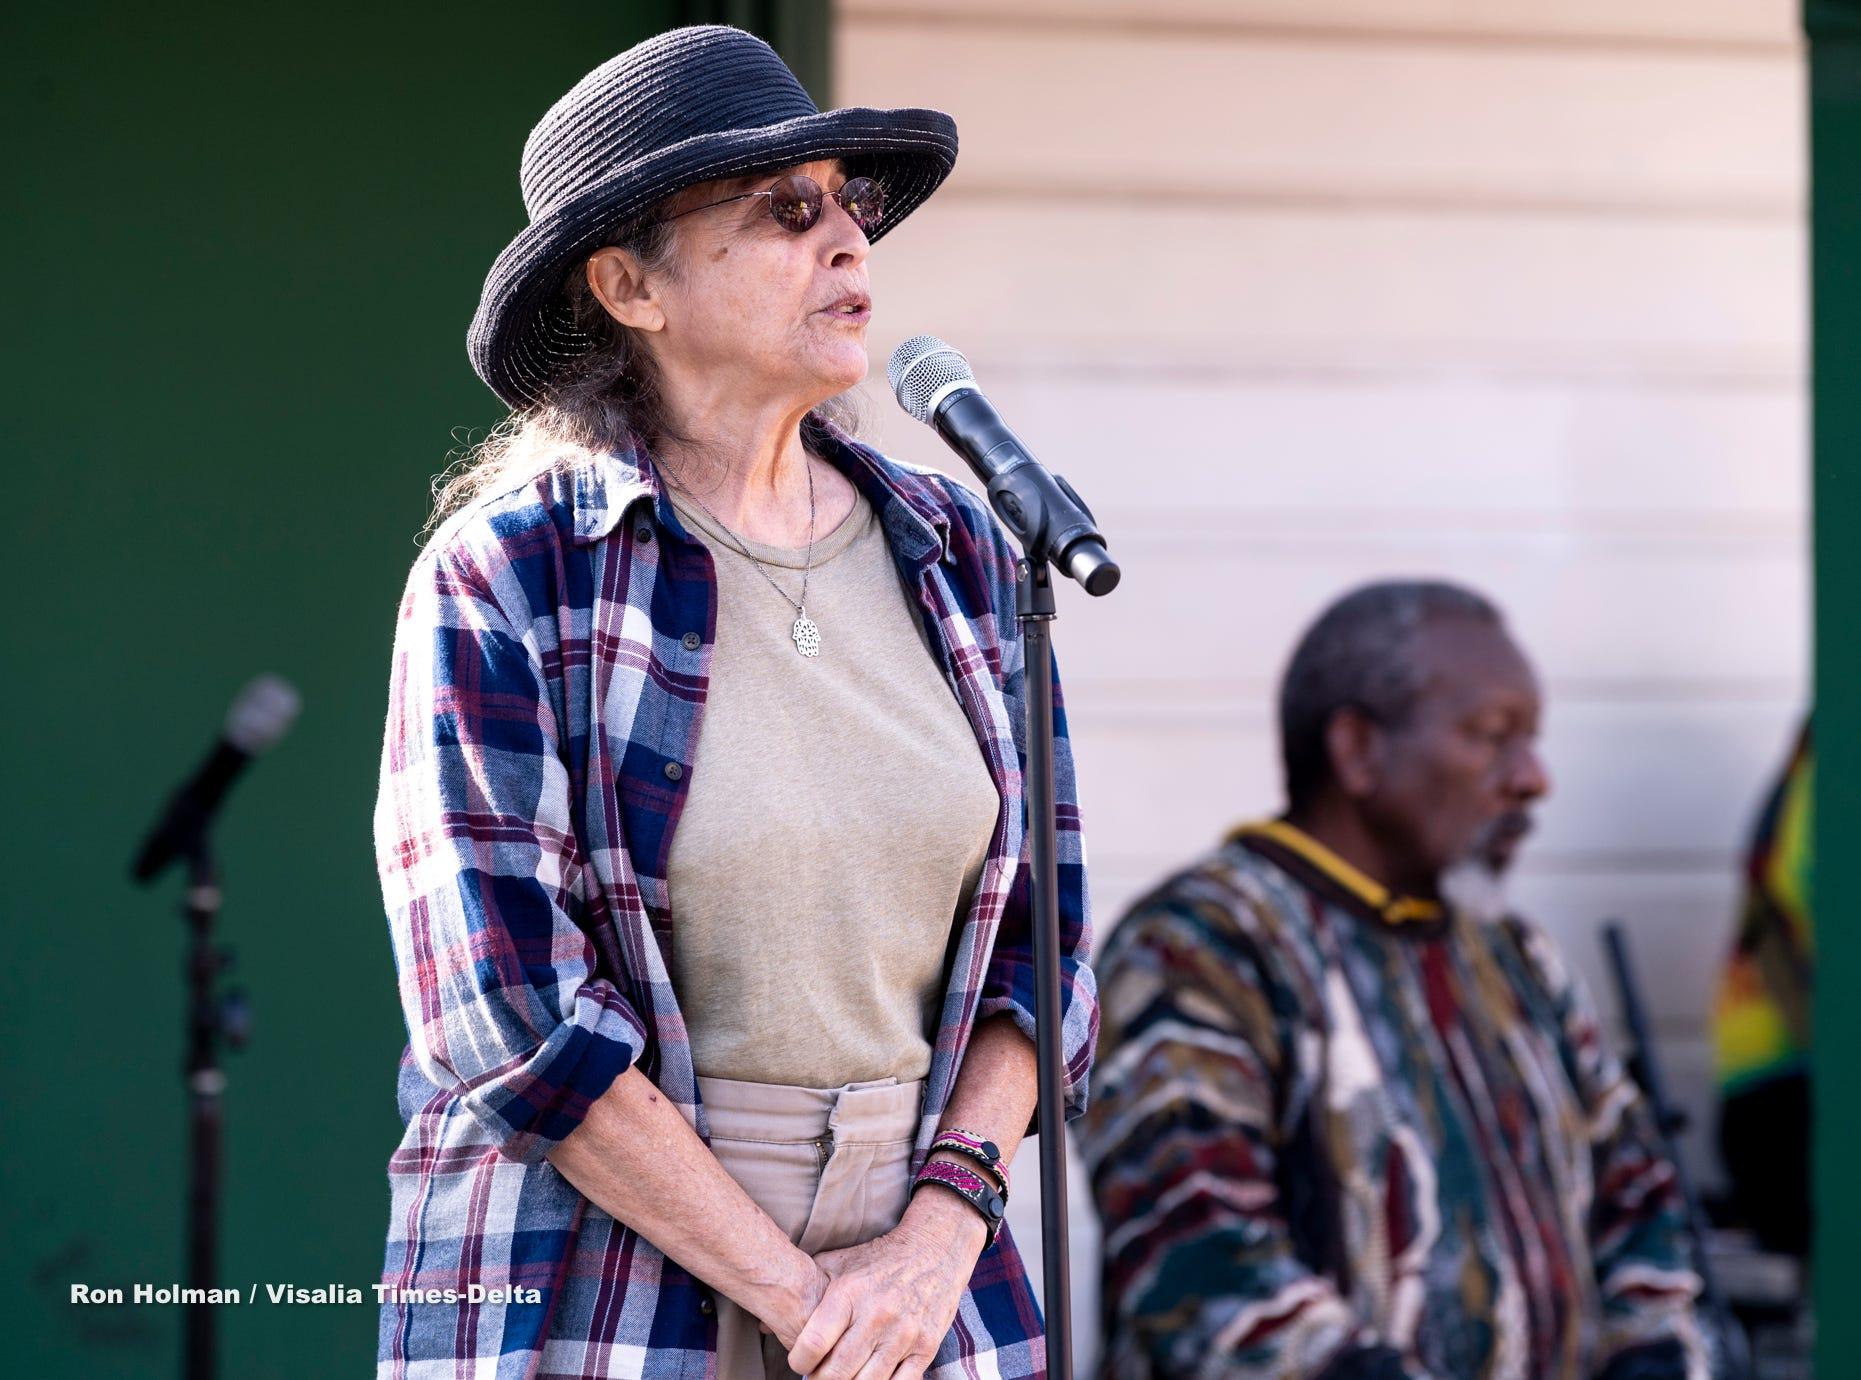 Keren Friedman speaks during the Women's March in Visalia on Saturday, January 19, 2019.